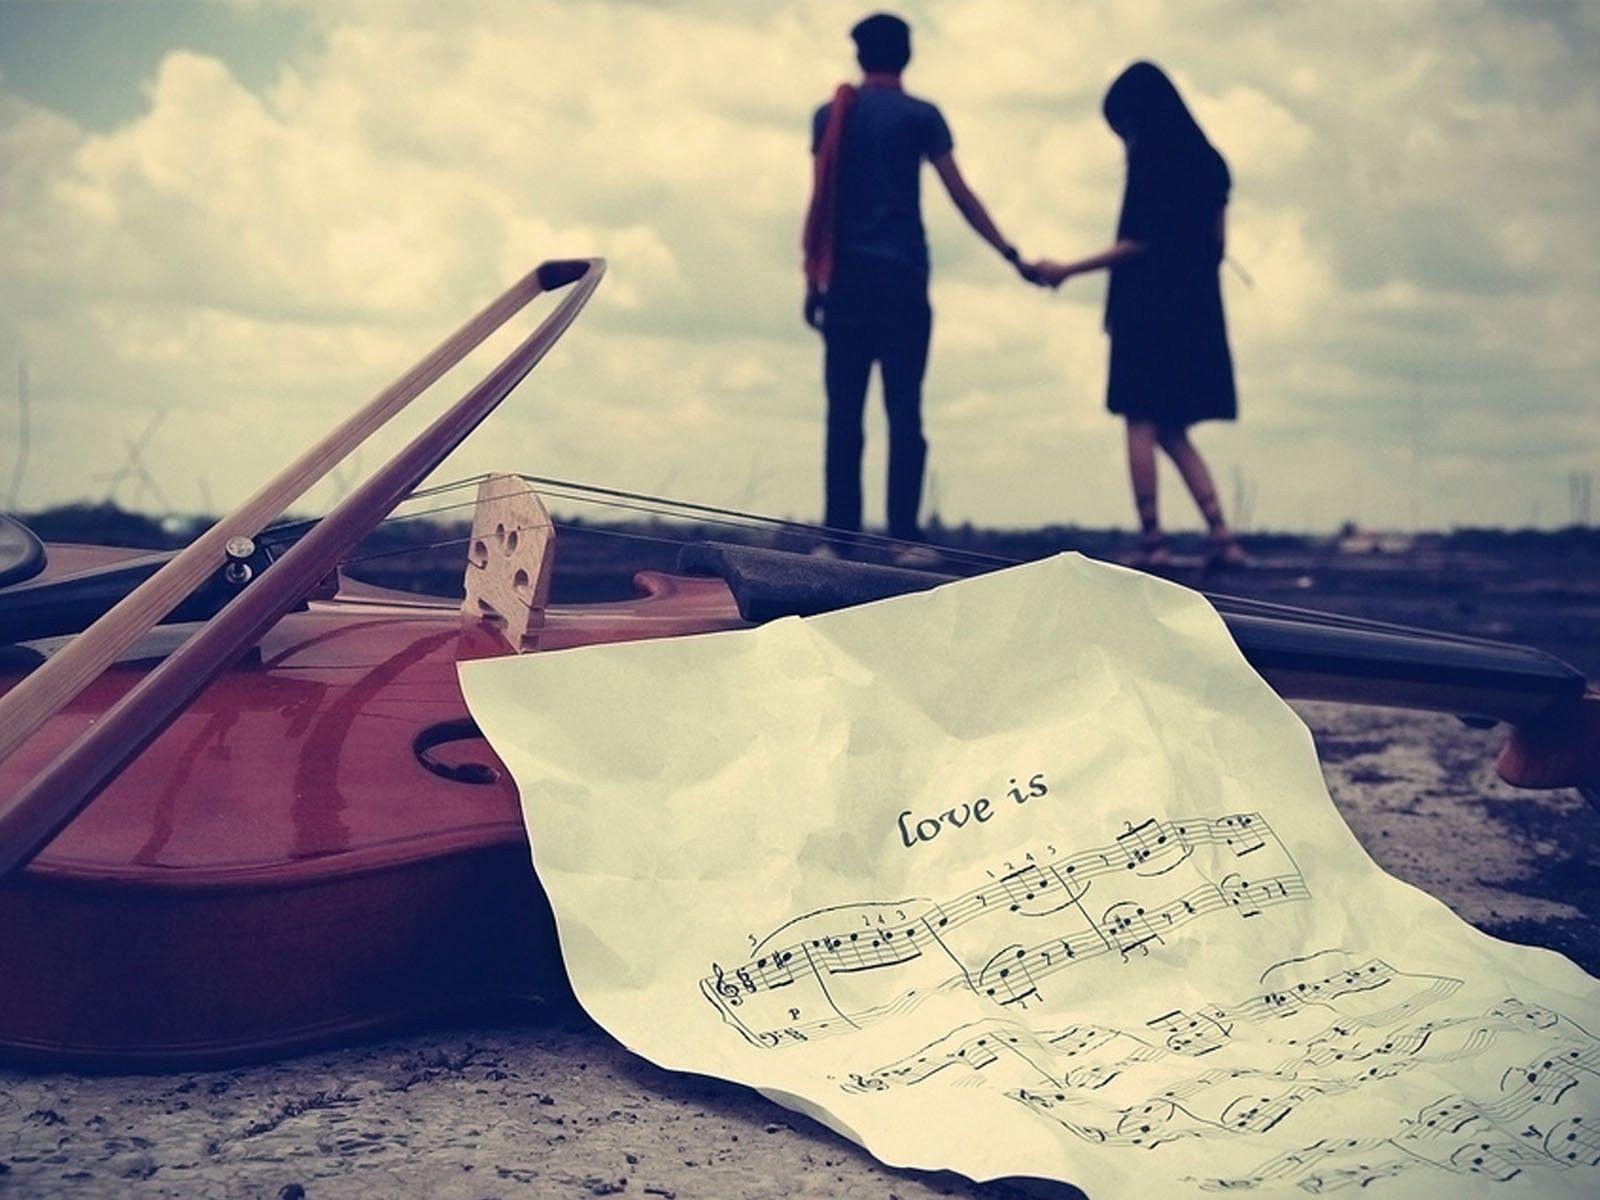 Hd wallpaper love couple - Love Couple Violins 1600x1200 Hd Wallpaper Hd Wallpapers 201